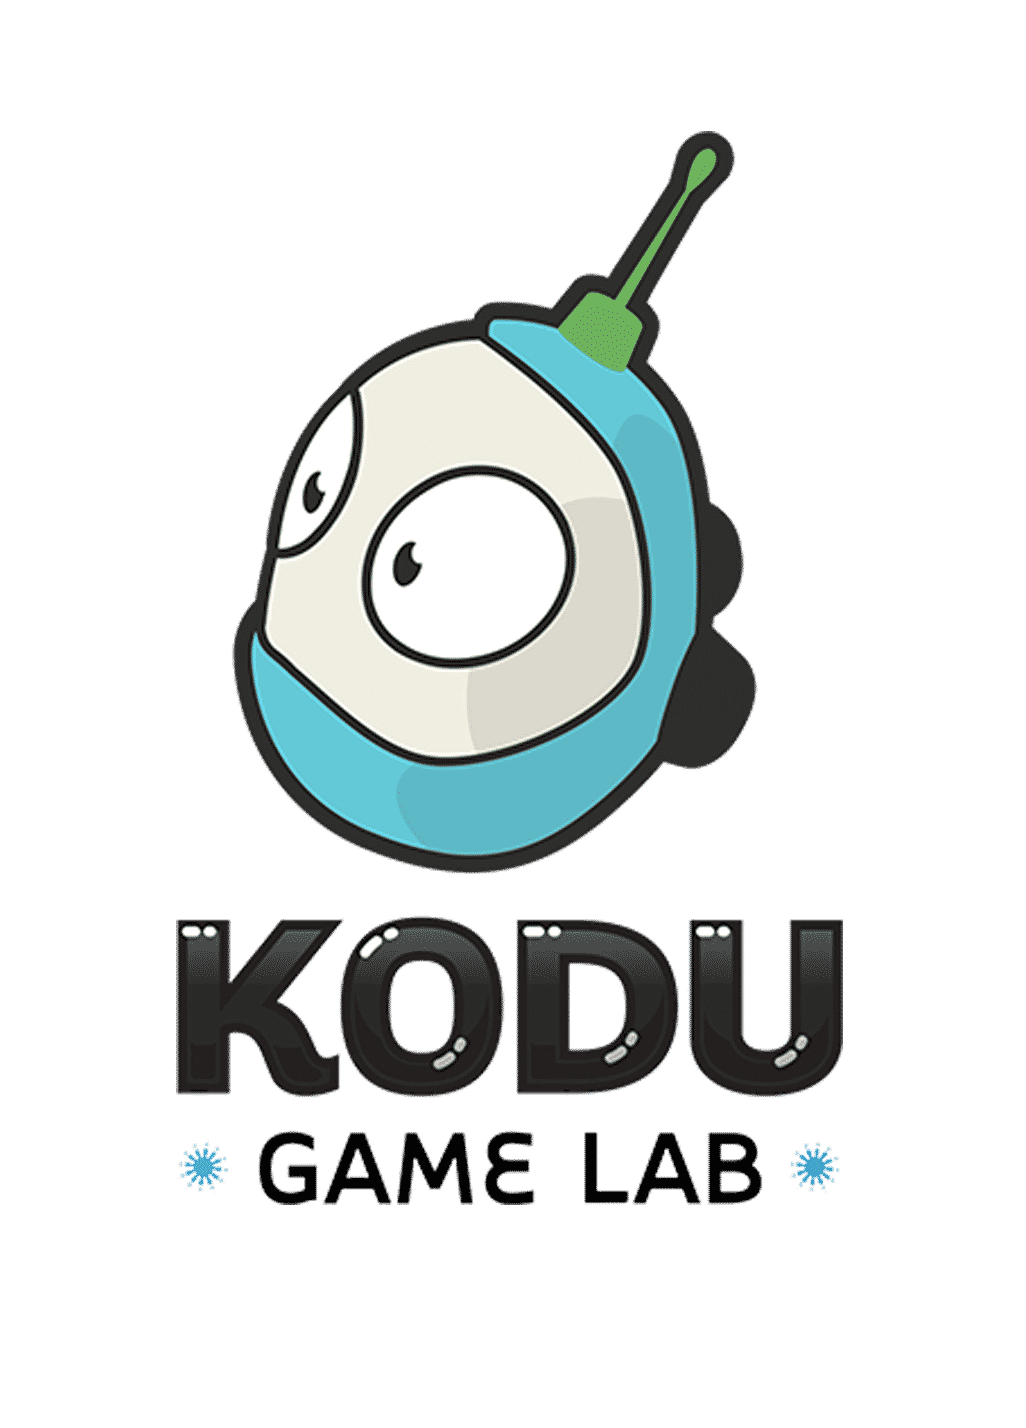 Logo KODU